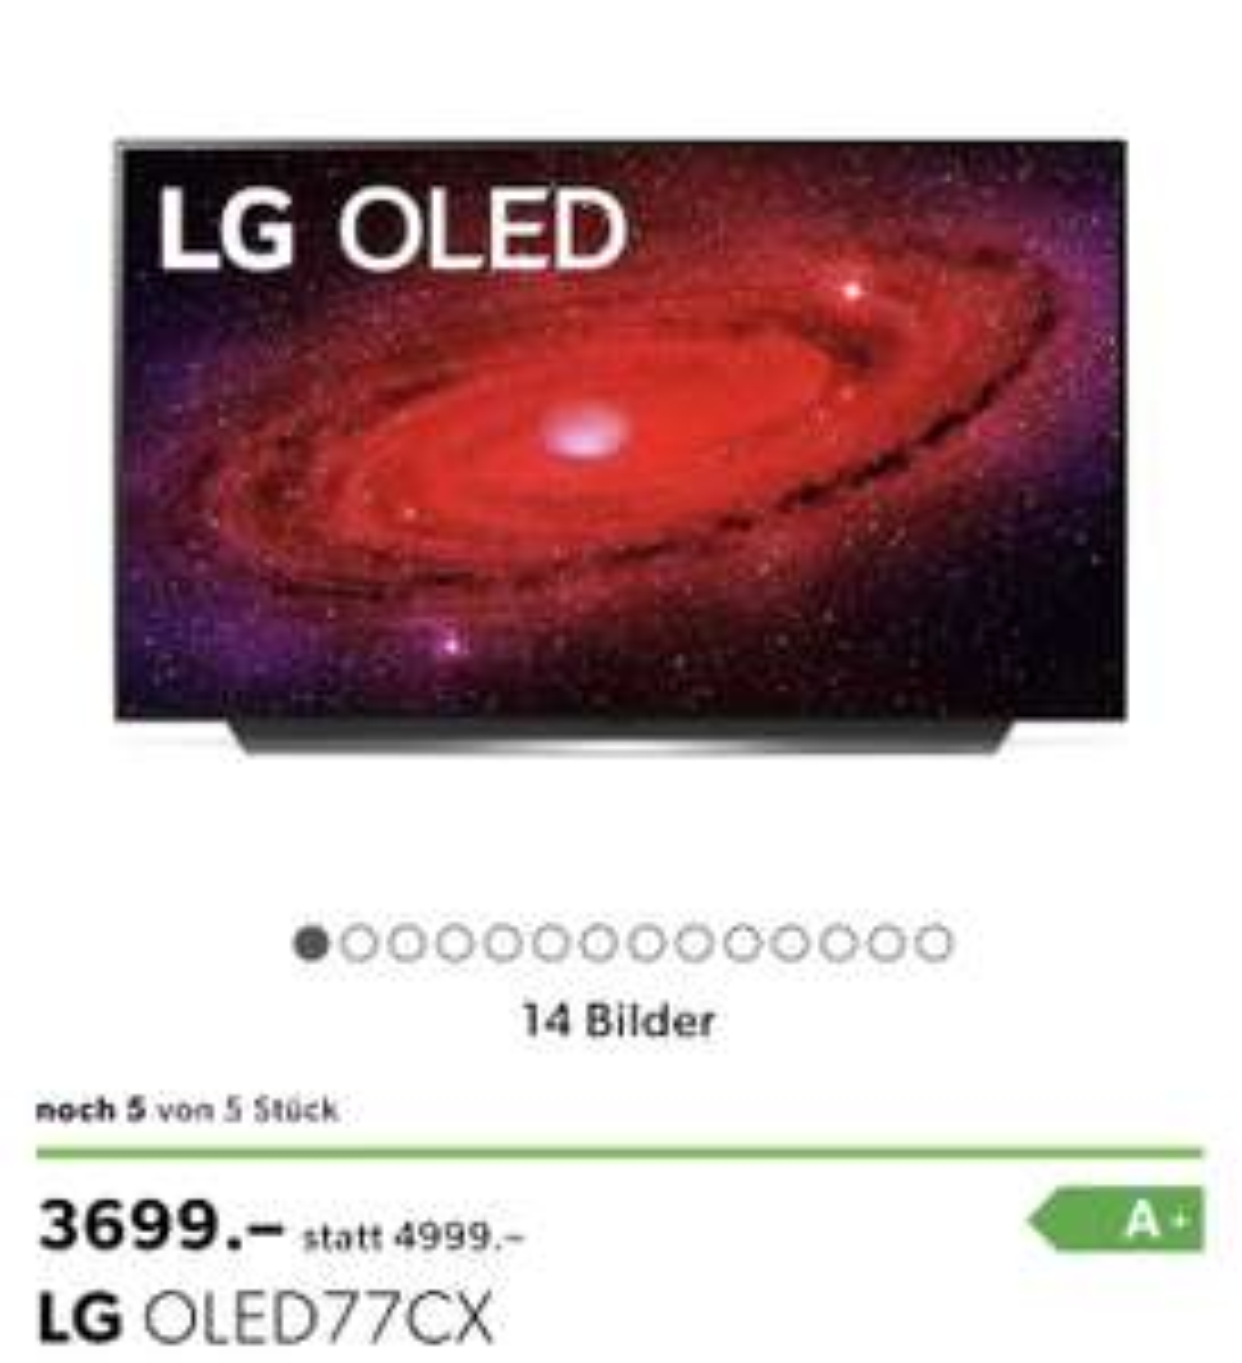 [Schweiz] LG OLED CX77